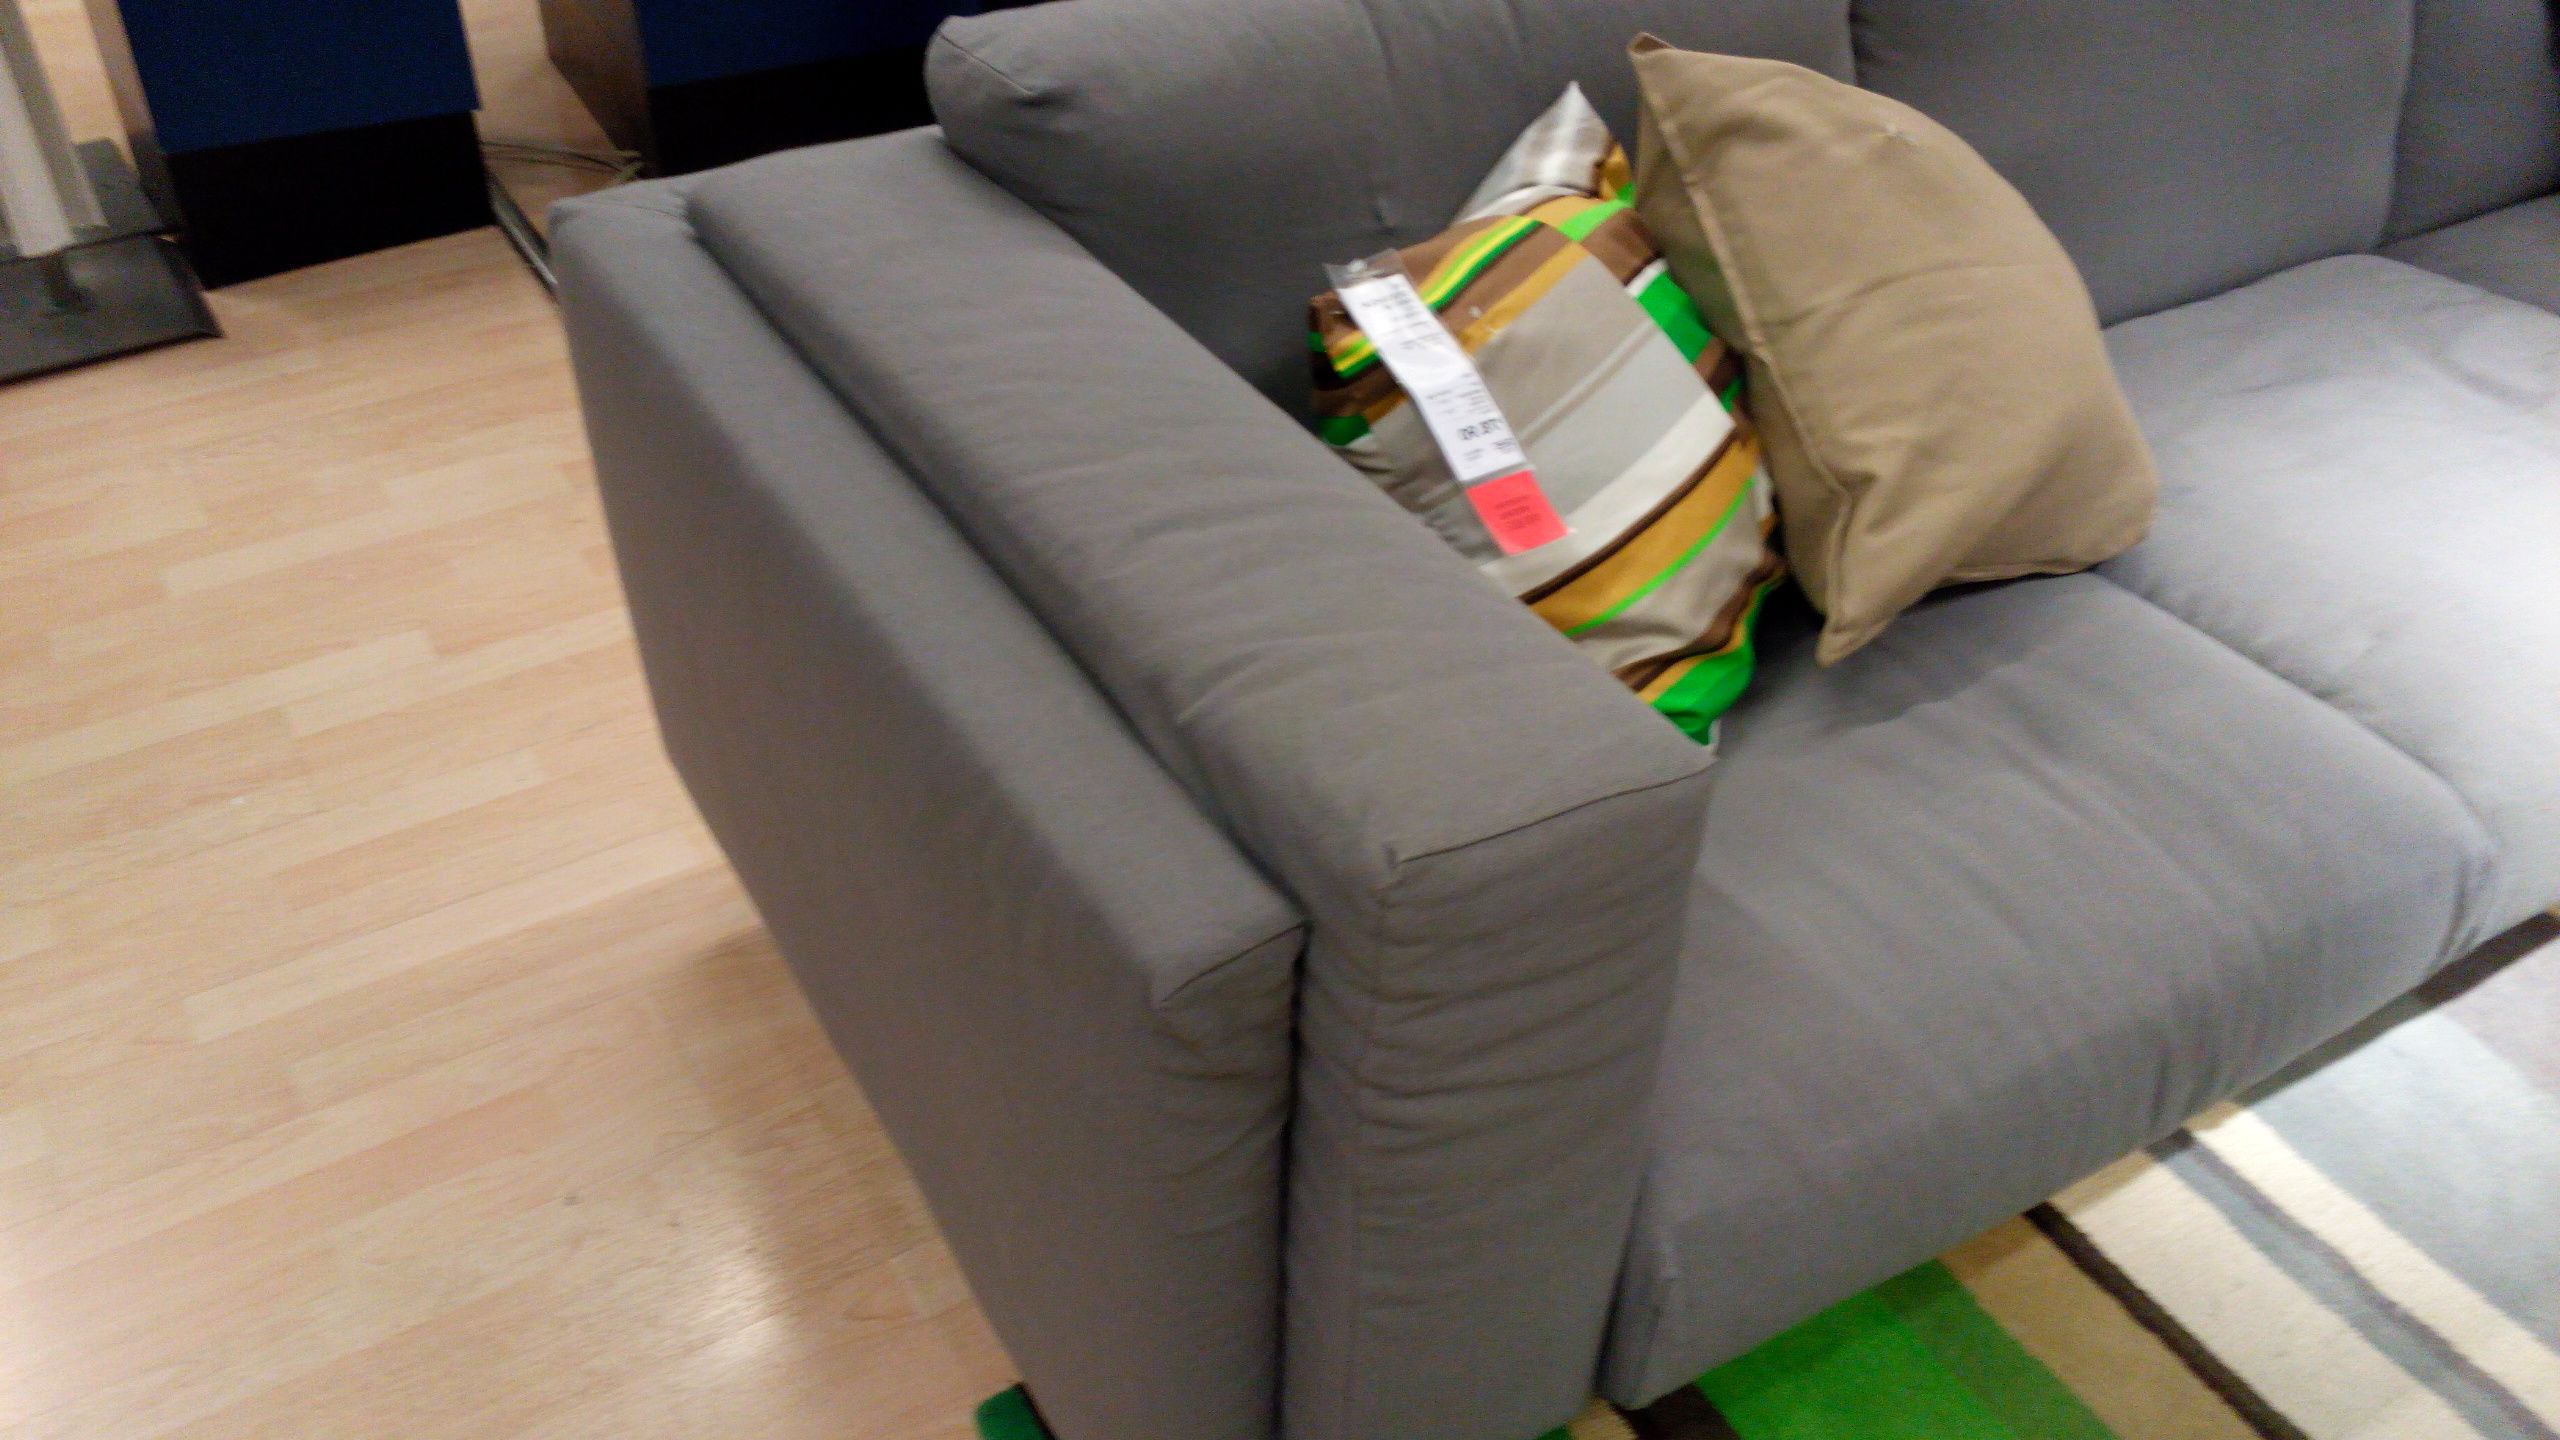 Sofa Nockeby Jxdu Ikea Nockeby sofa Review New Ikea Couch Series Mid 2014 fort